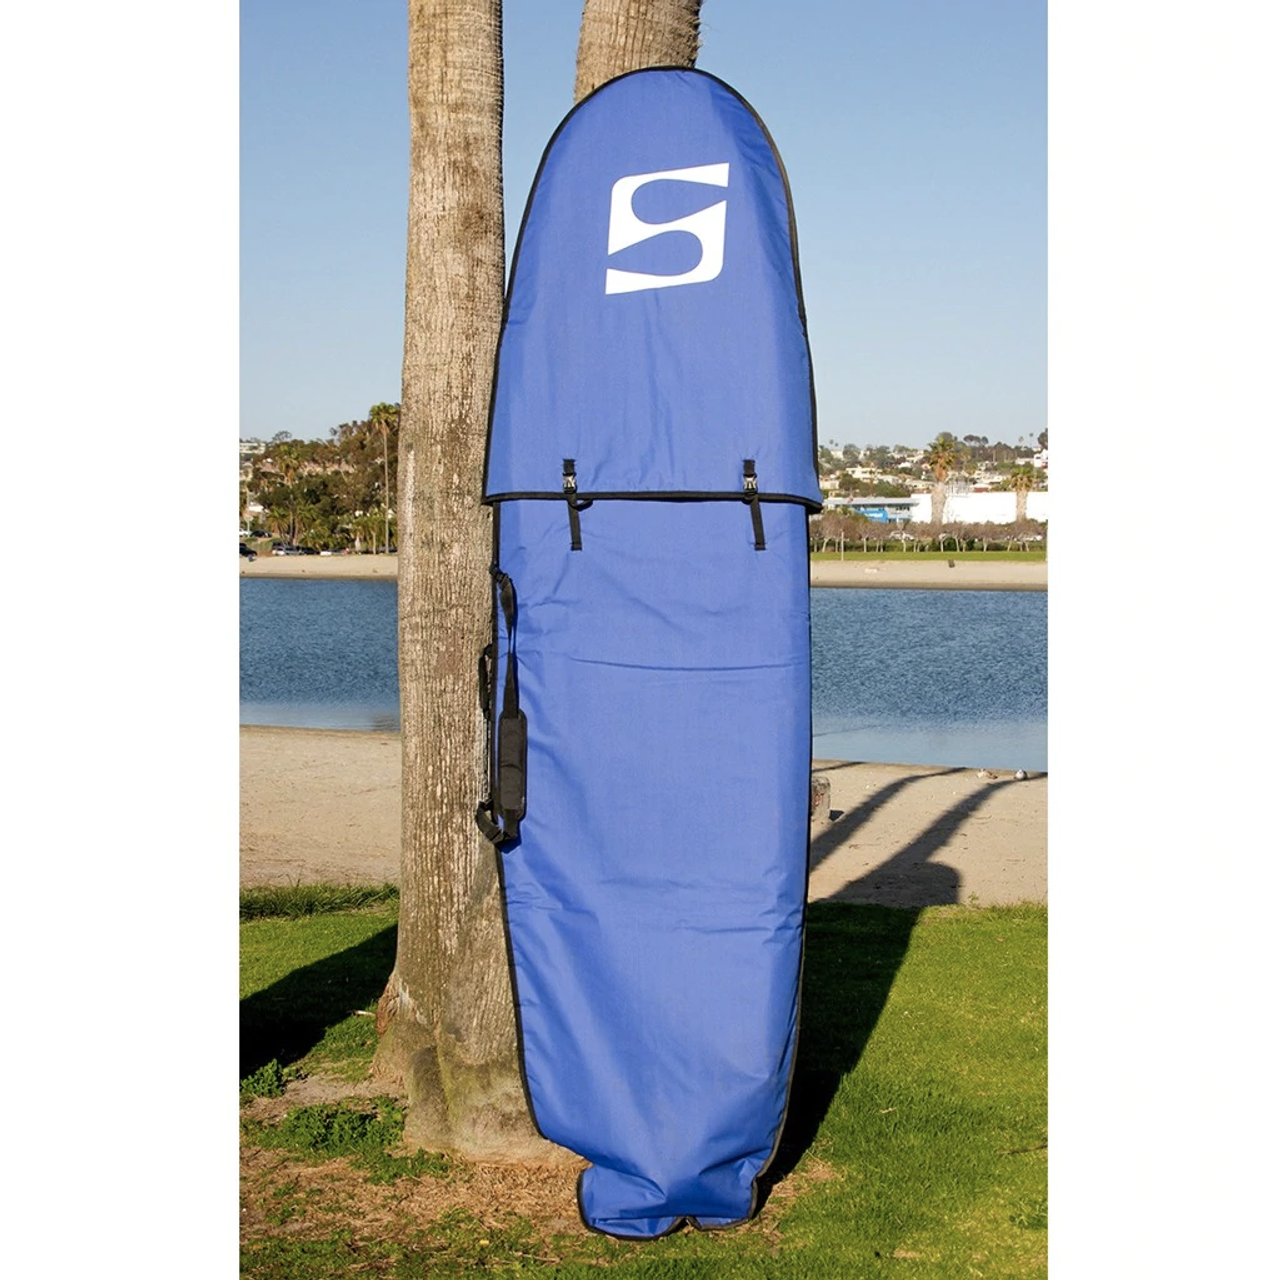 "Adjustable Surfboard Travel Bag | Fits Surfboards 8'6"" to 10'"